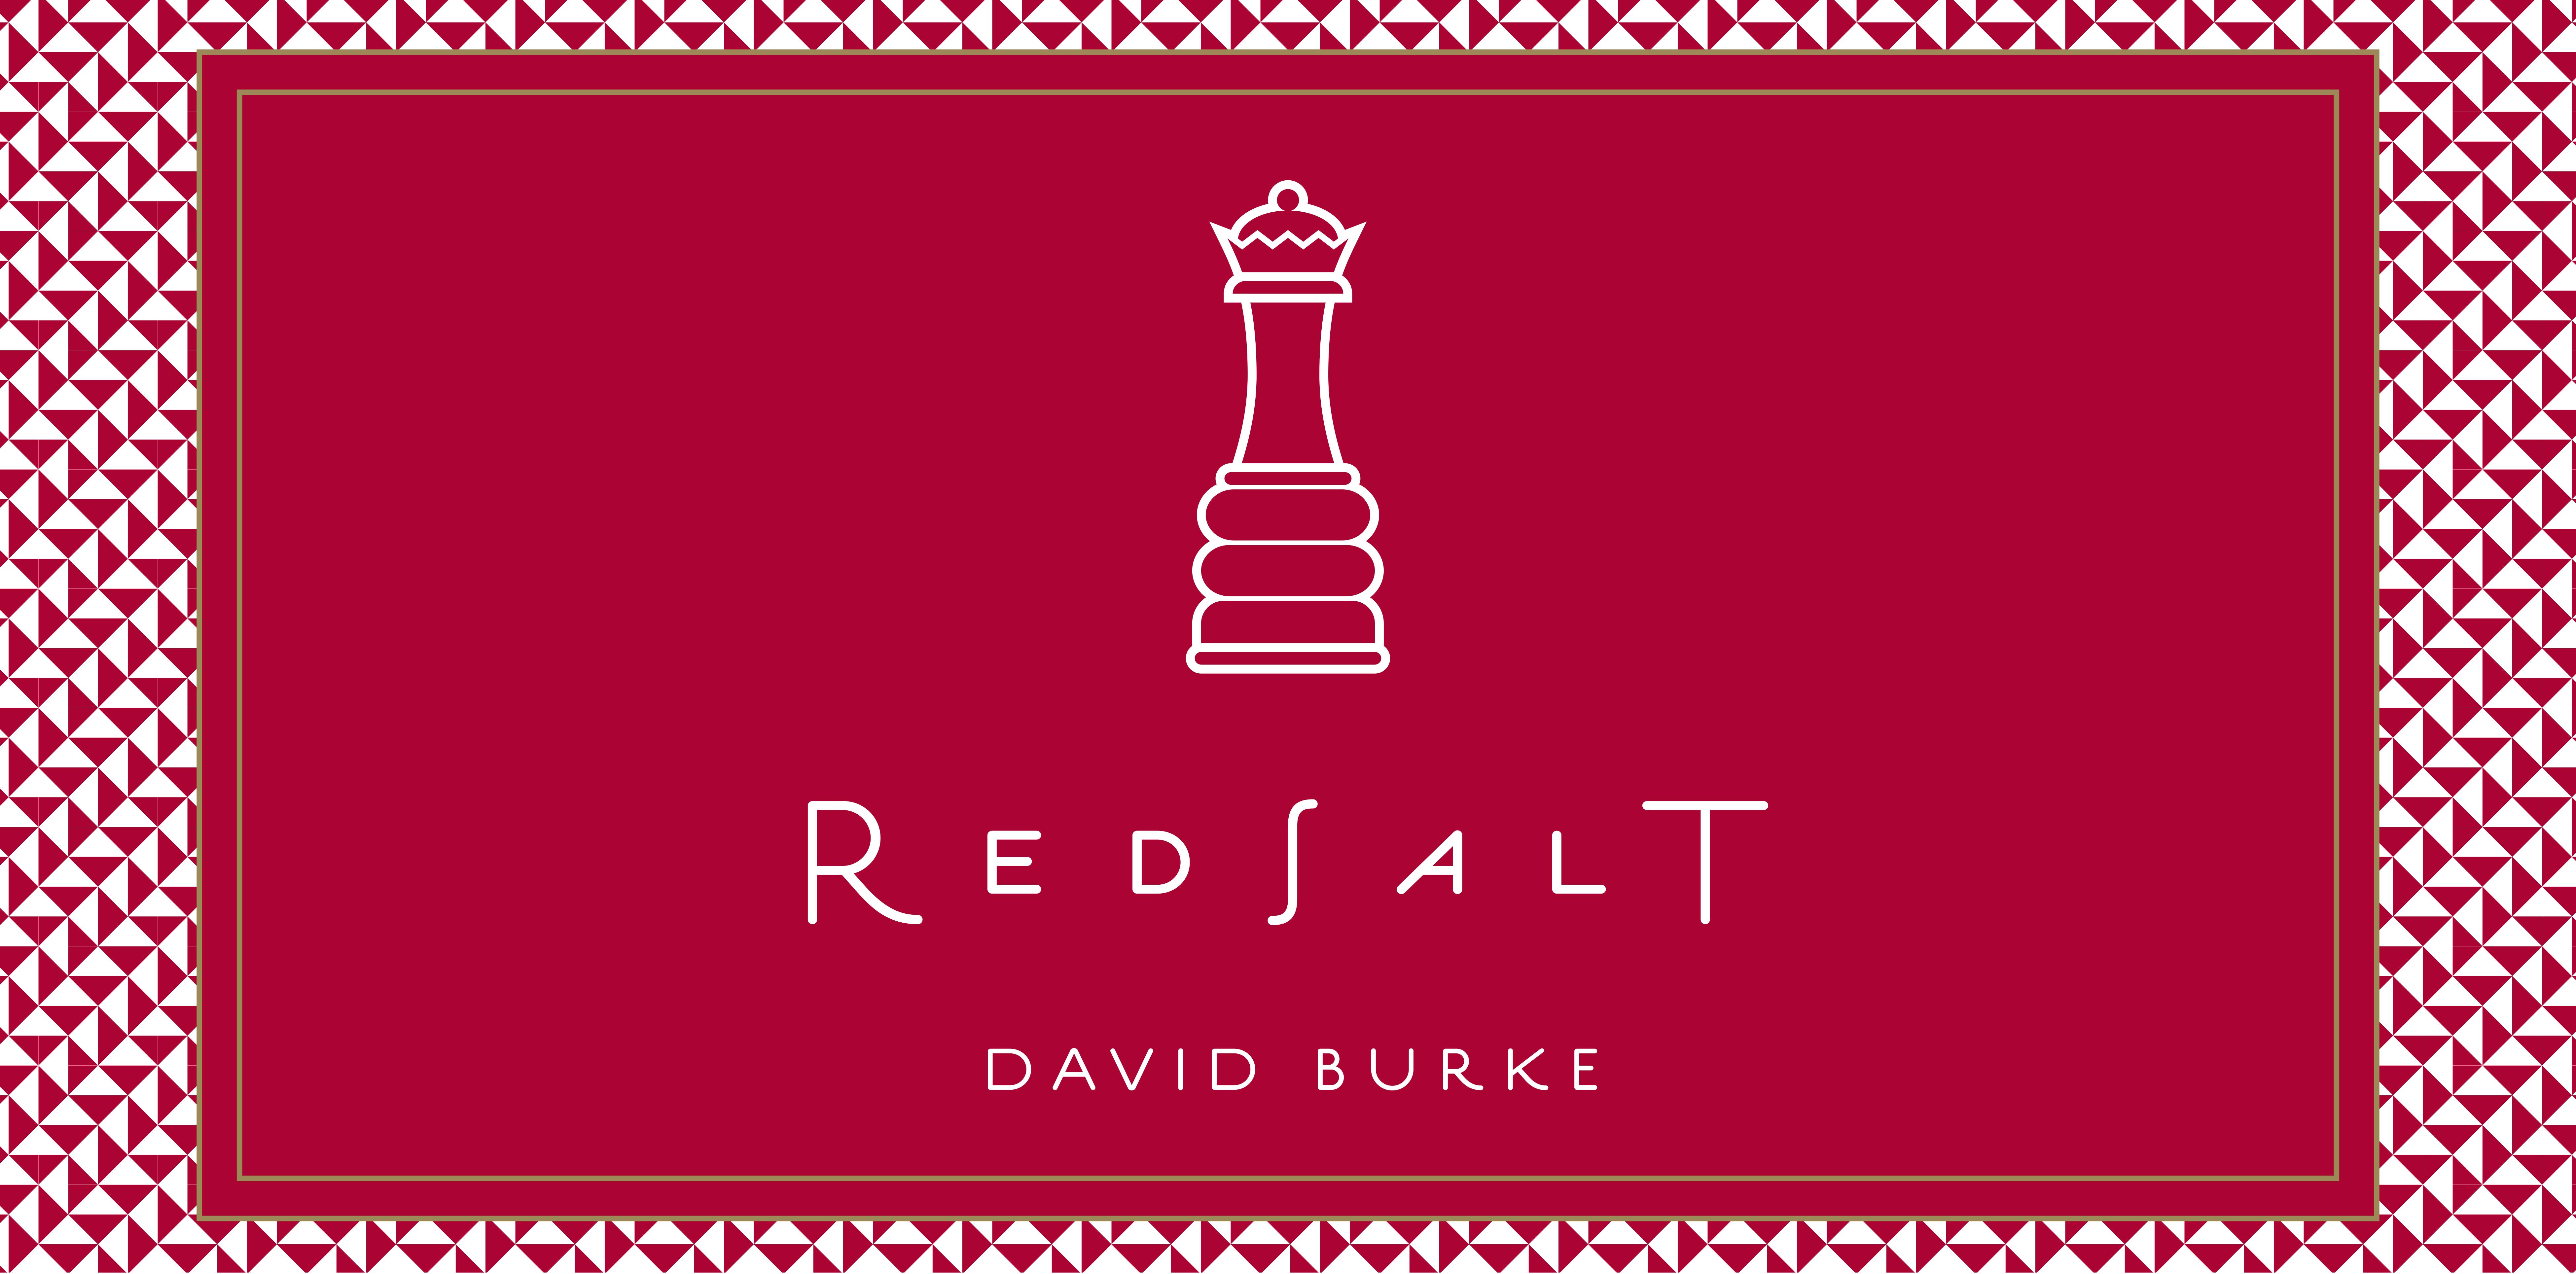 Red Salt David Burke logo